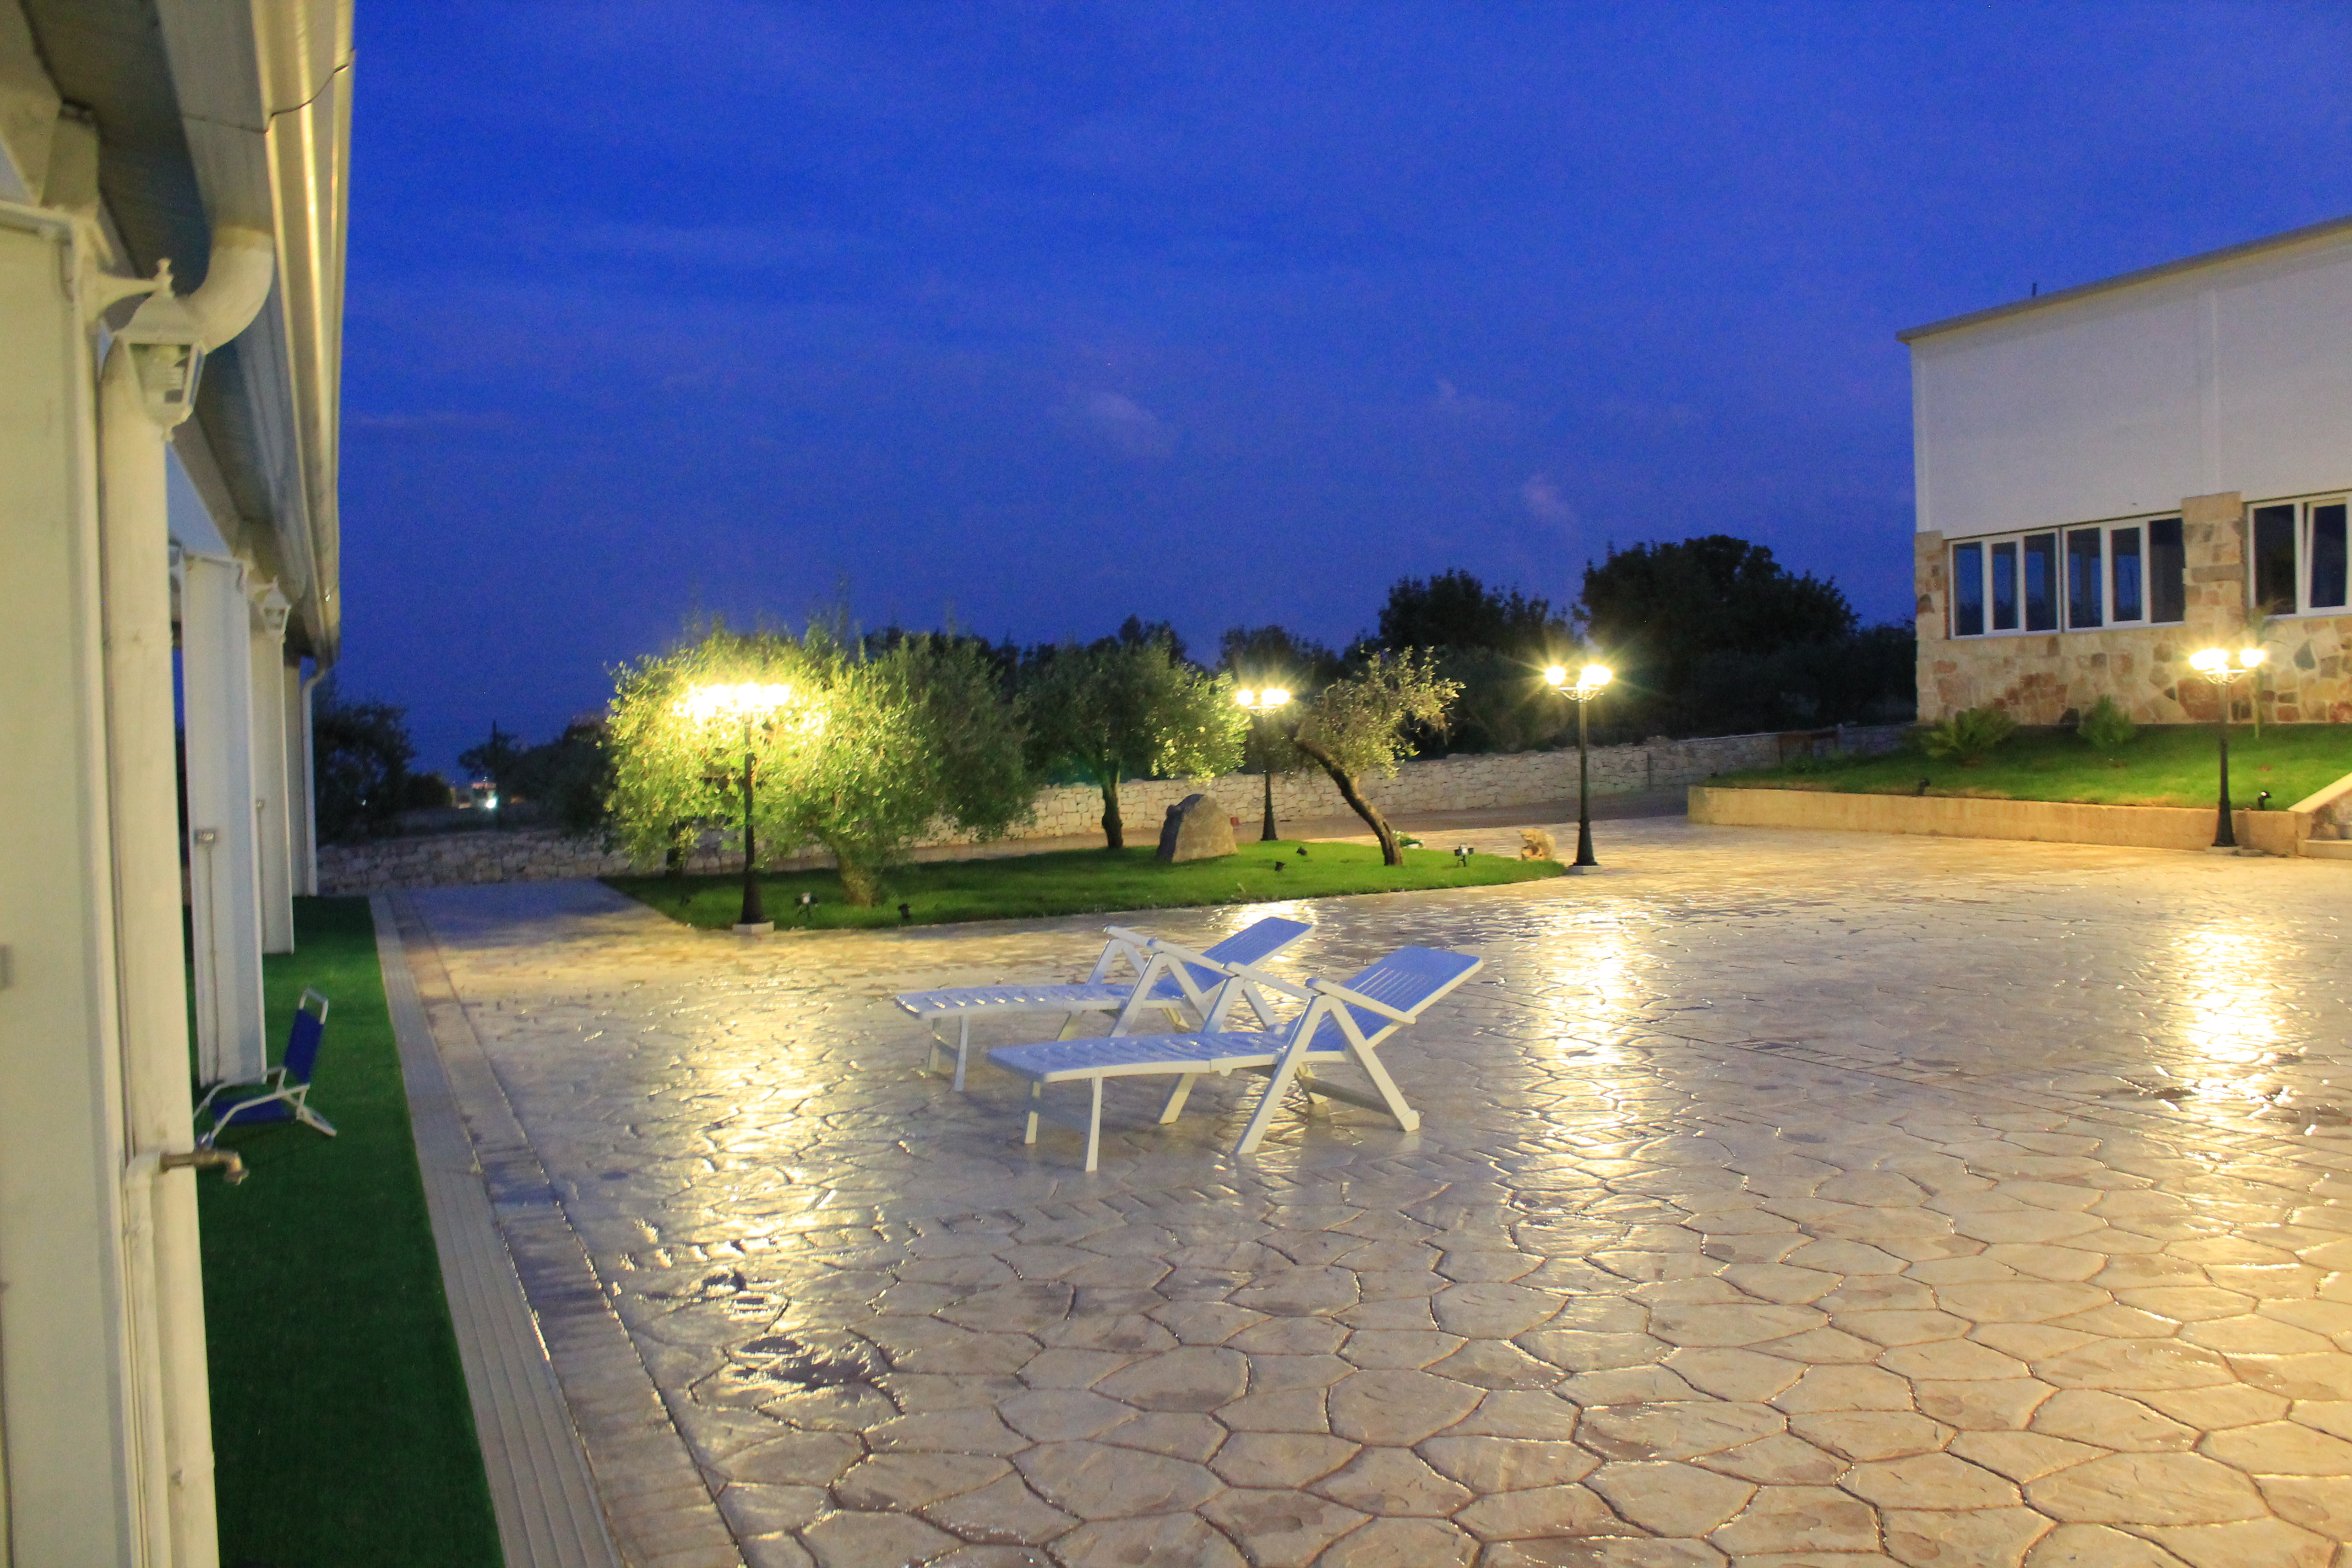 Appartement de vacances Agriturismo Le Due Palme - Das Paradies Von Adamo (2506981), Modica, Ragusa, Sicile, Italie, image 6